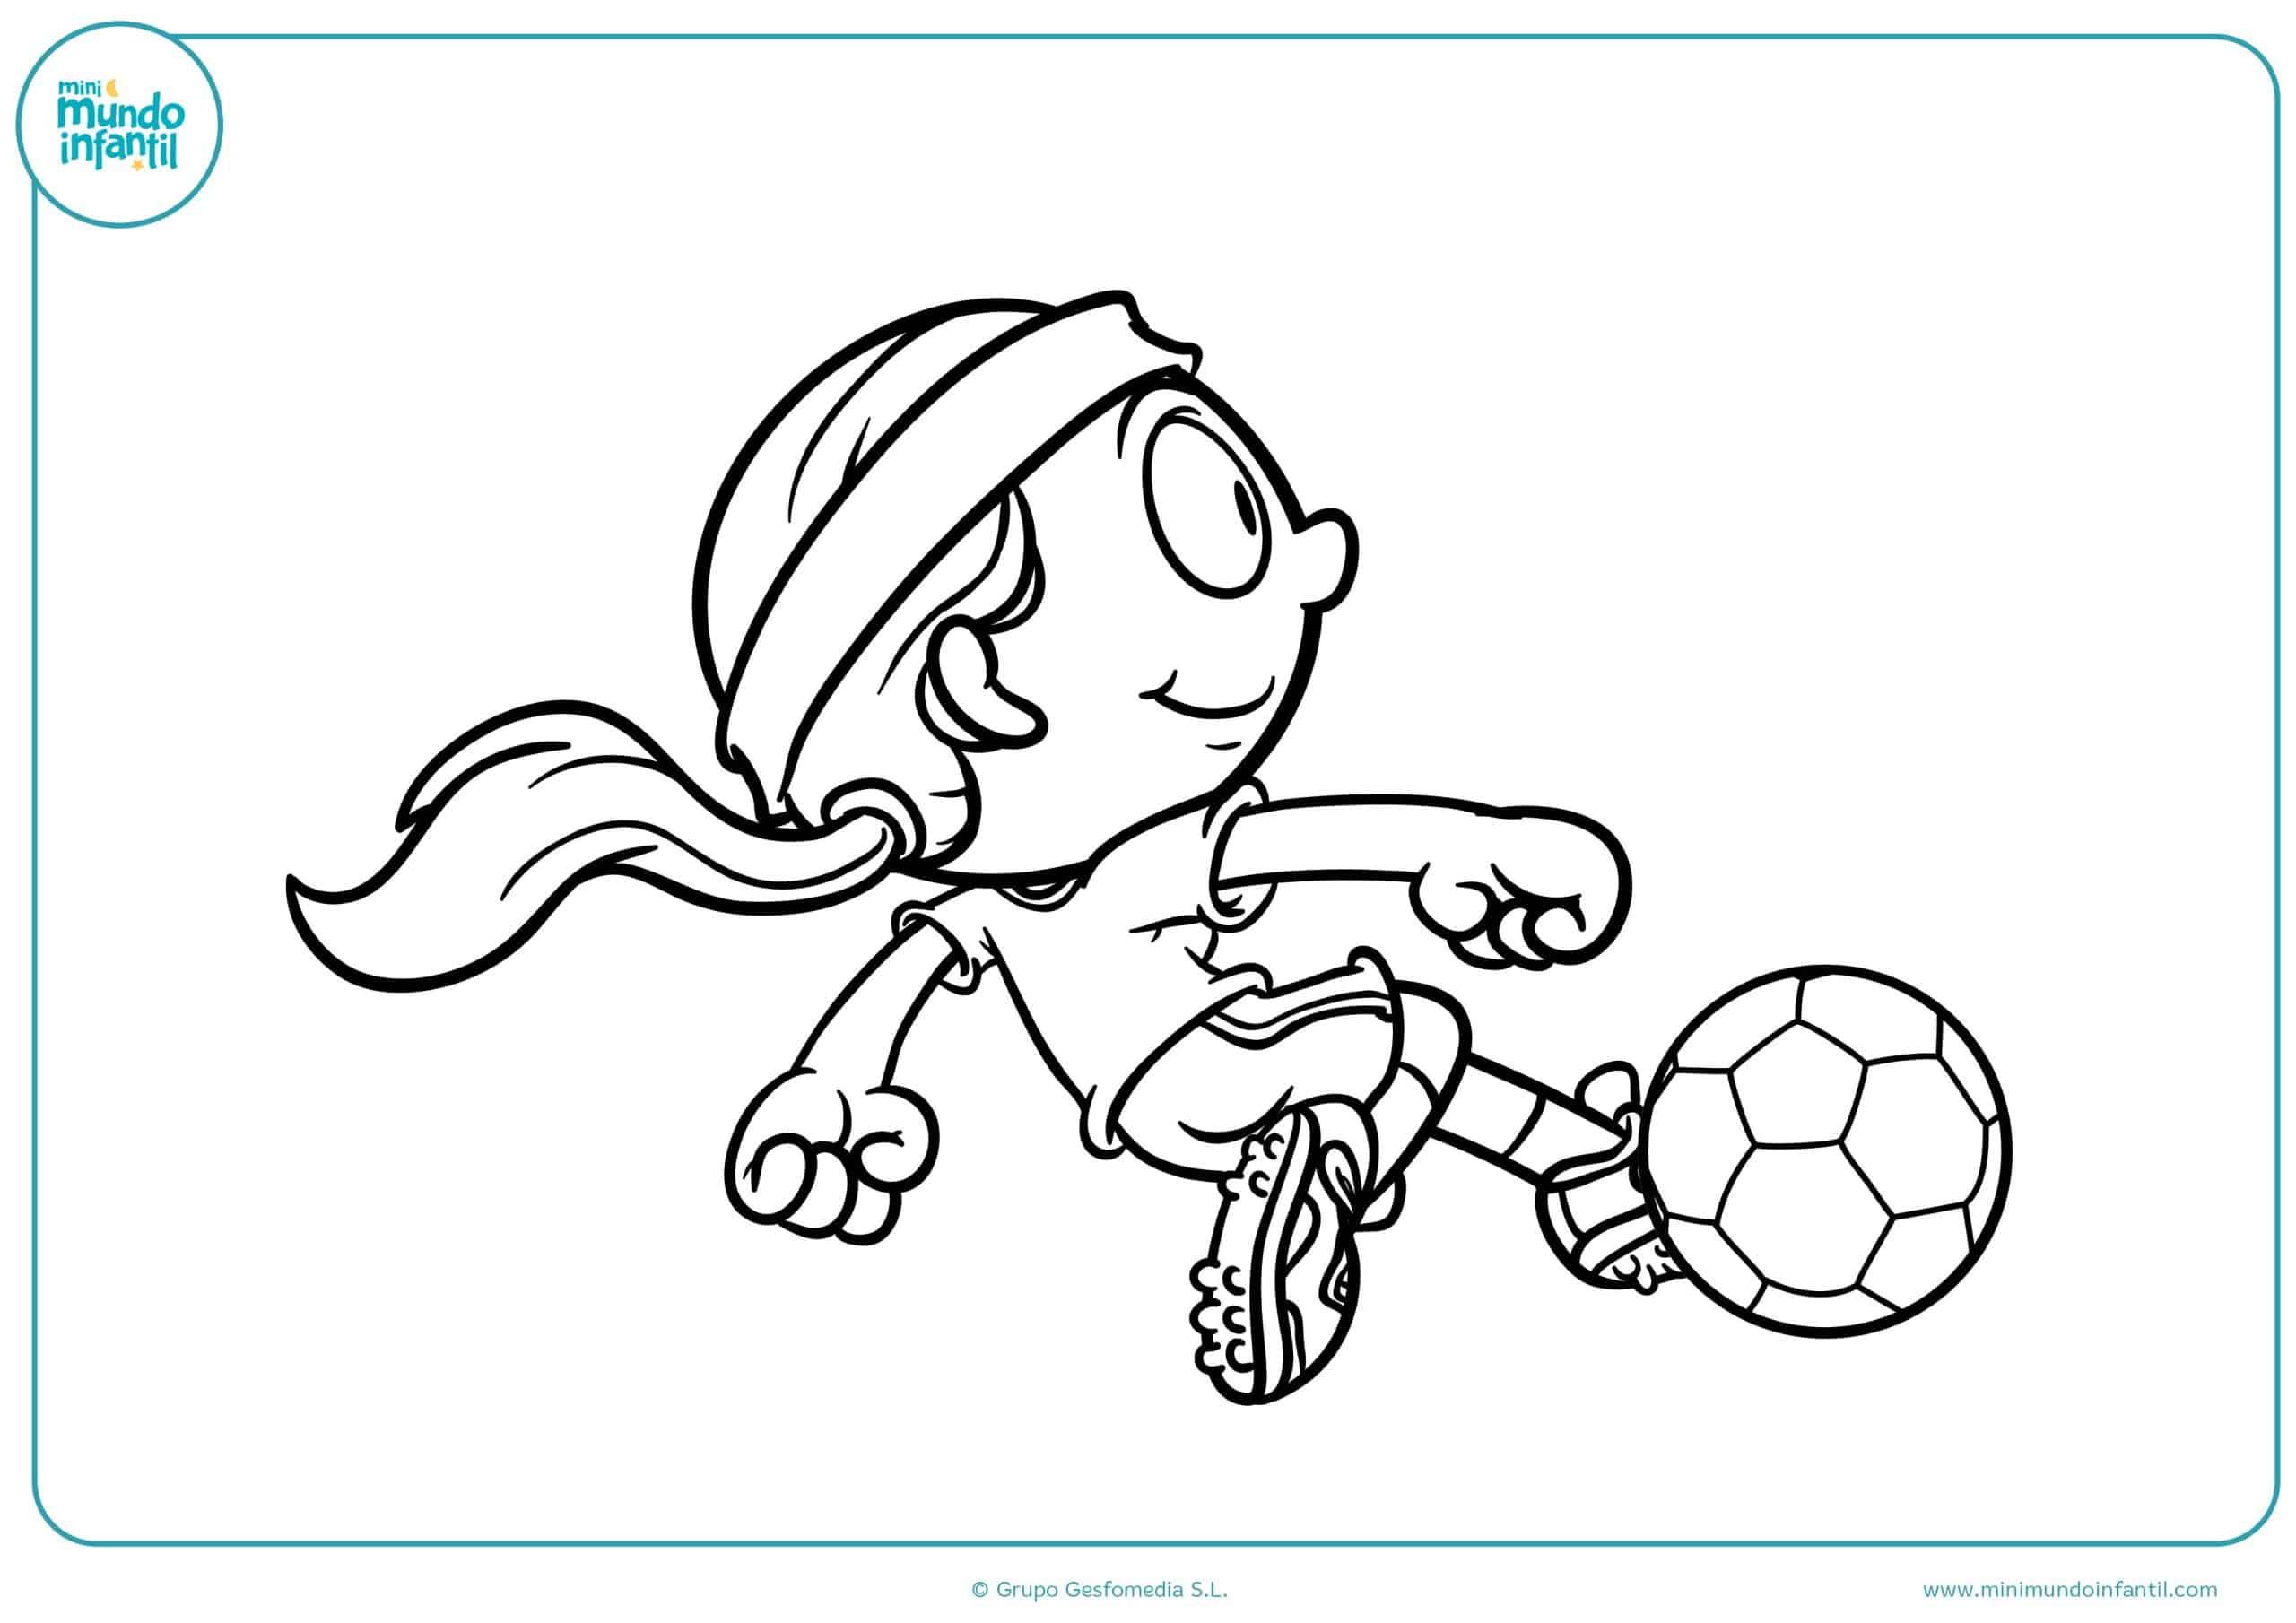 Dibujos De Futbolistas Famosos Para Colorear: Los Mejores Dibujos De Fútbol Para Colorear E Imprimir